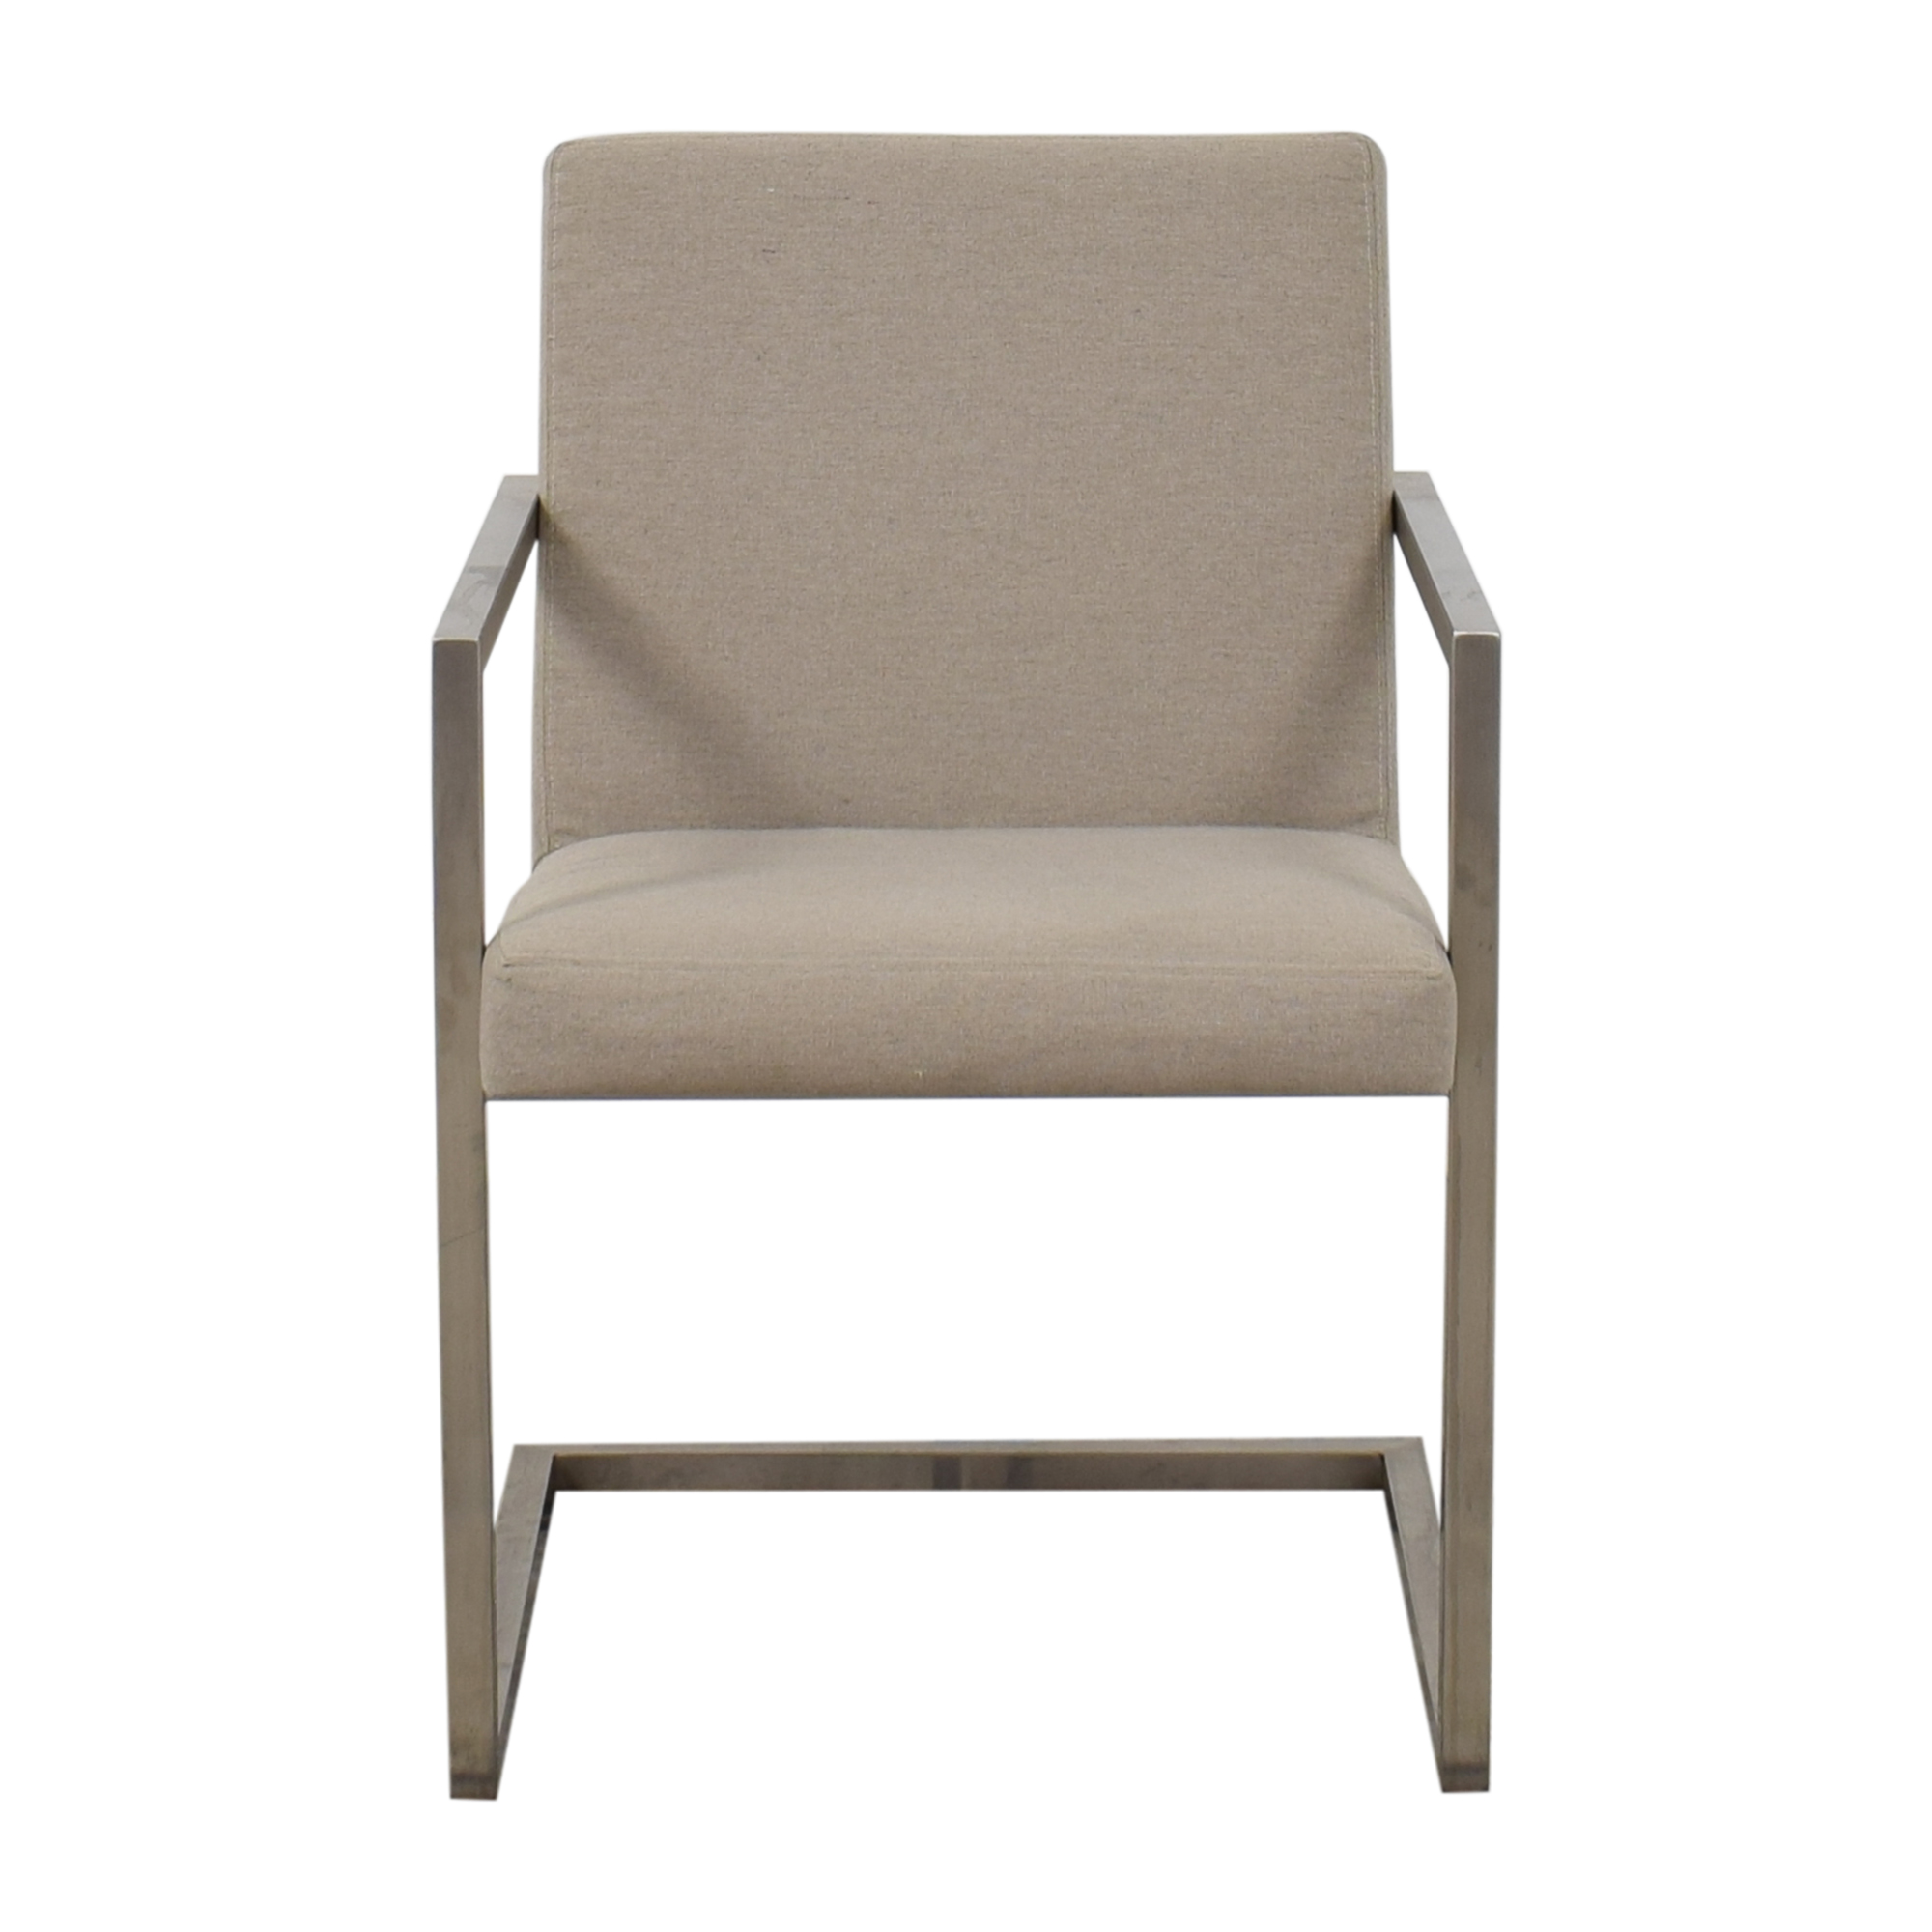 Room & Board Room & Board Lira Dining Arm Chair nyc